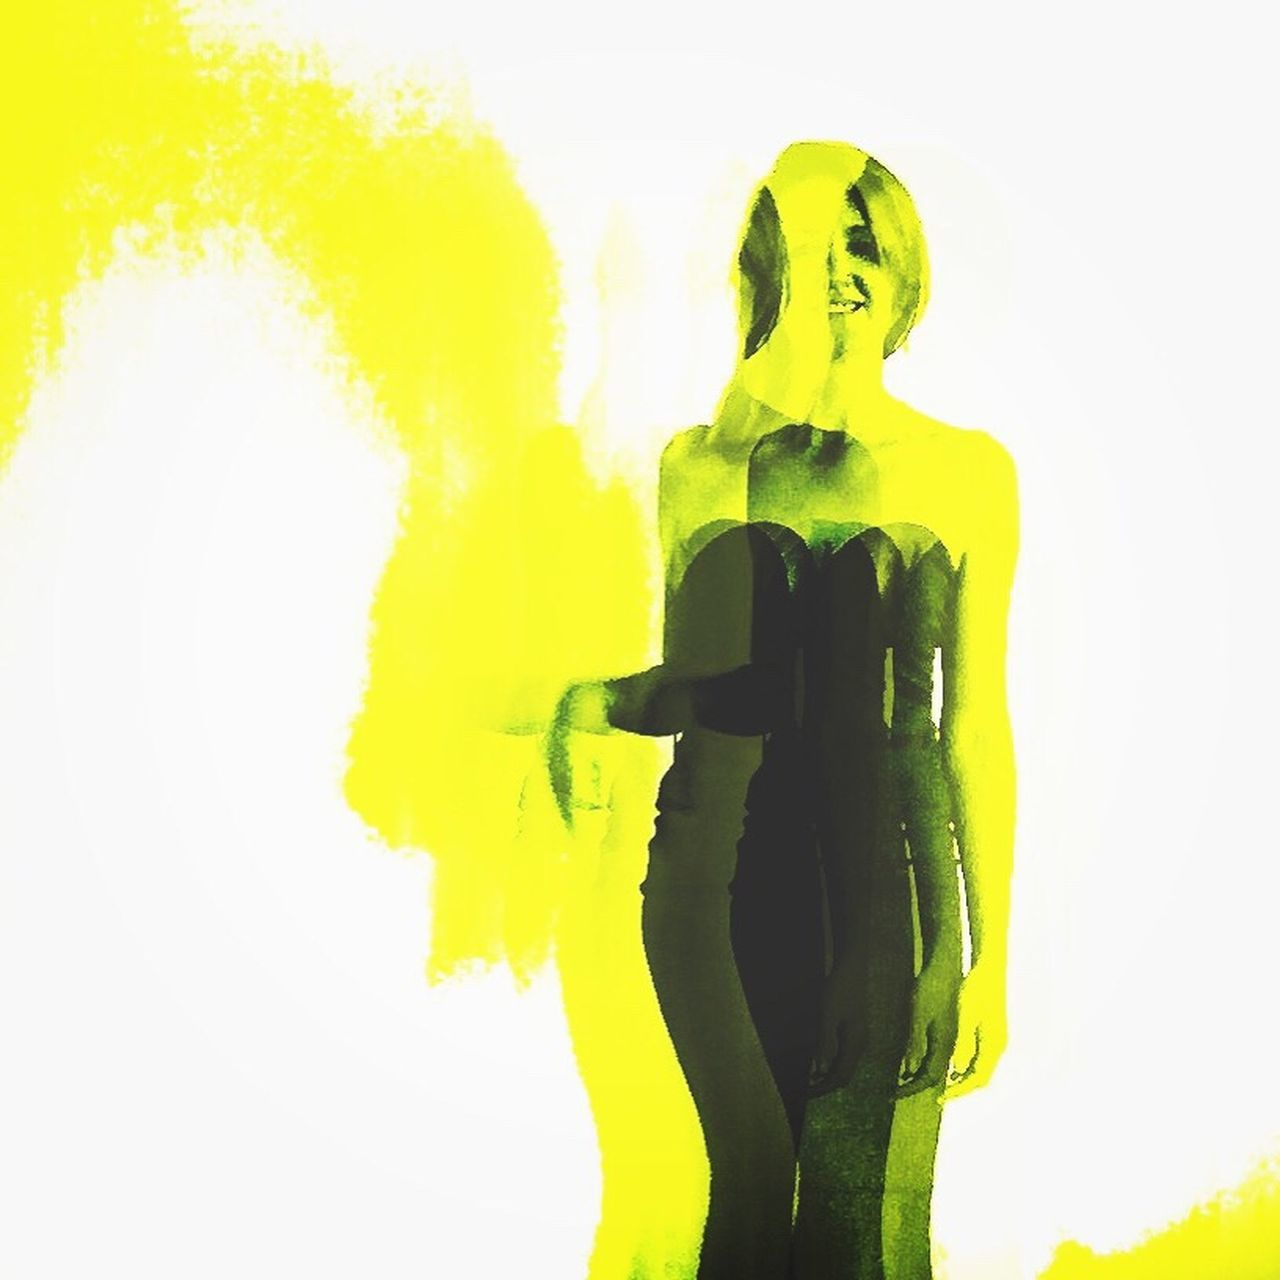 Andy Warhol Velvet Underground Yellow WIWT Decim8 Dress One Person White Background Tall Dresses Silhouette Ootd Scotland